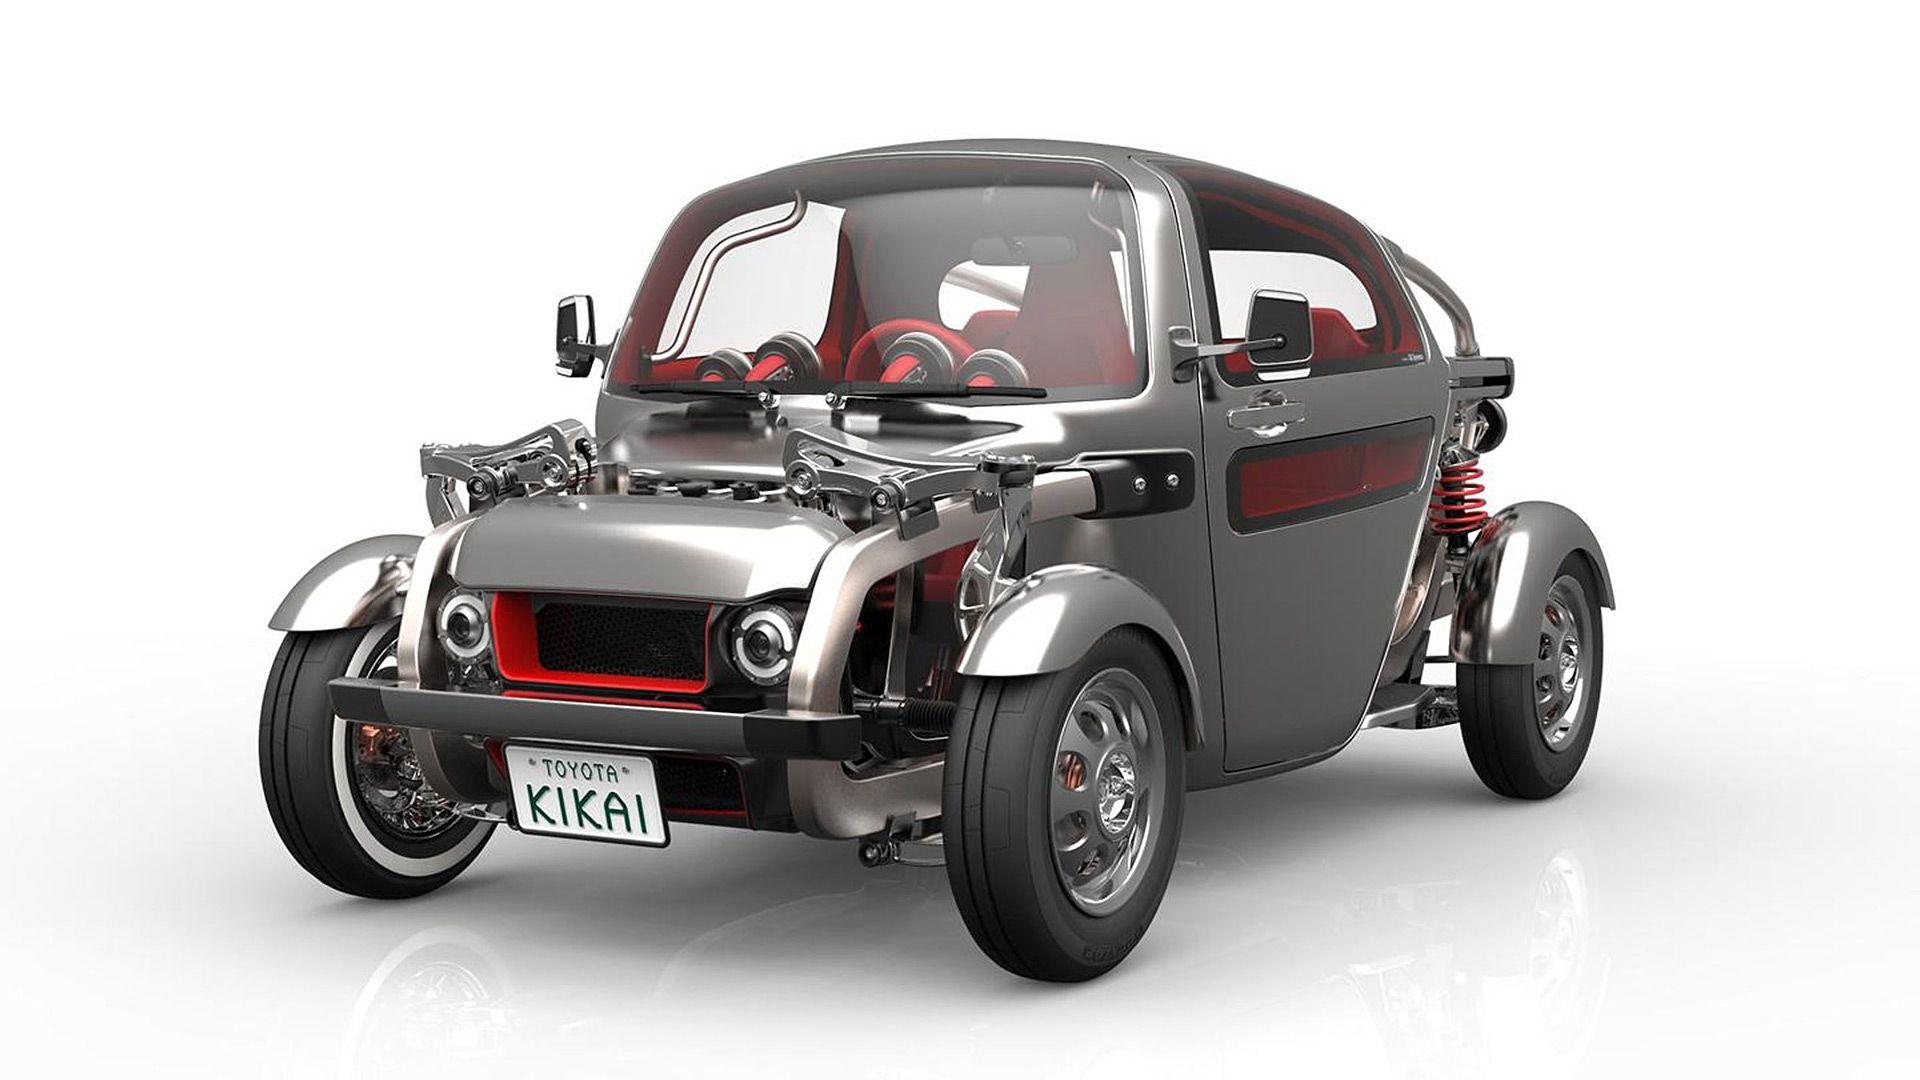 2015 Toyota Kikai Concept  http://www.wsupercars.com/toyota-2015-kikai-concept.php